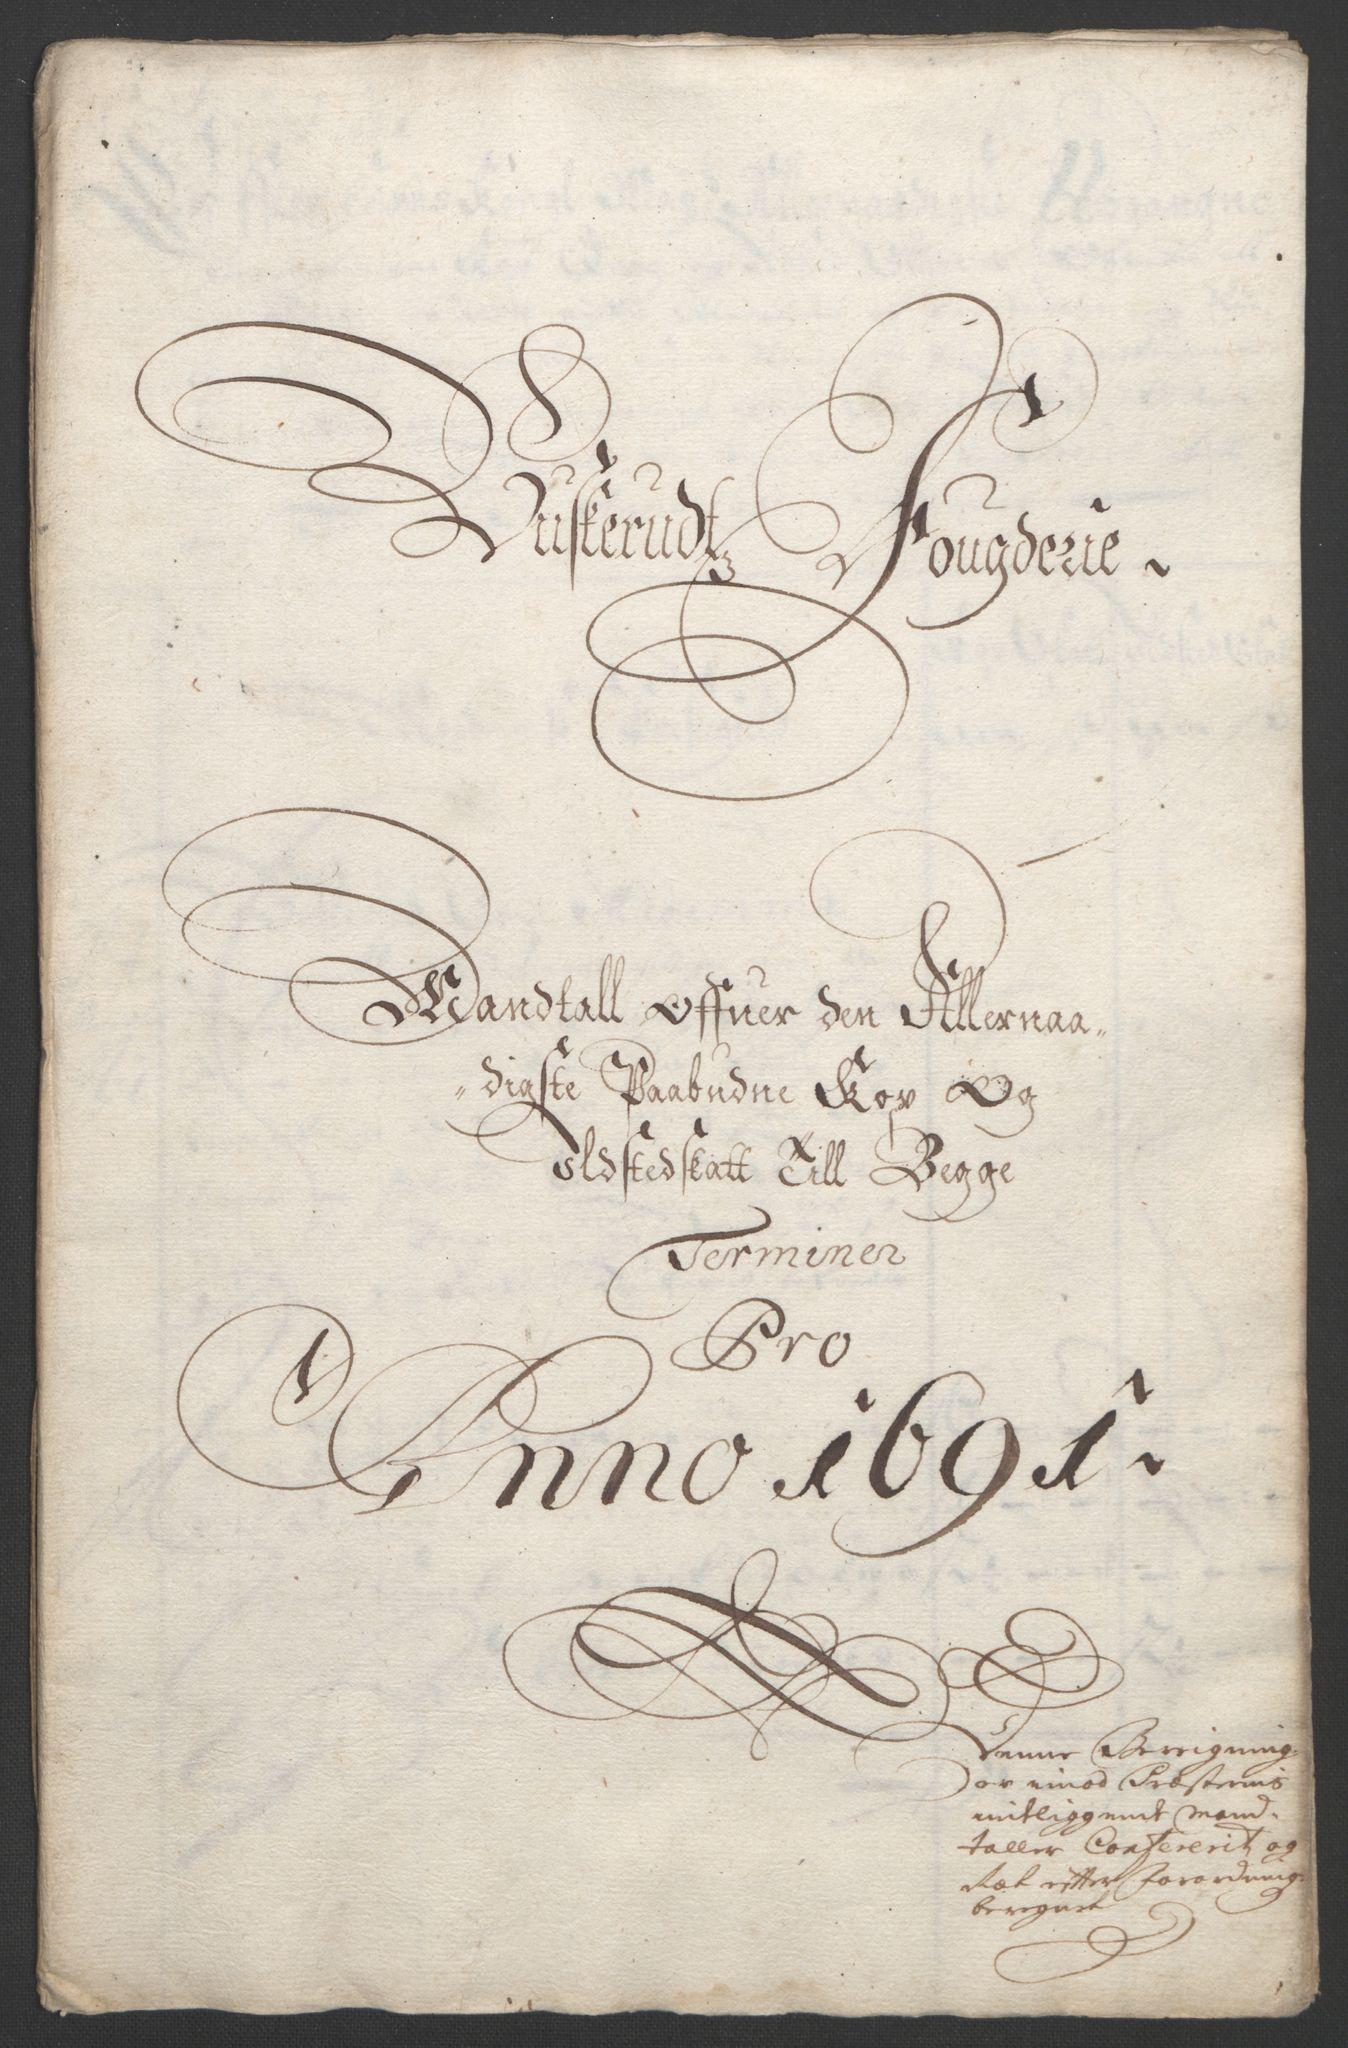 RA, Rentekammeret inntil 1814, Reviderte regnskaper, Fogderegnskap, R25/L1681: Fogderegnskap Buskerud, 1691-1692, s. 258